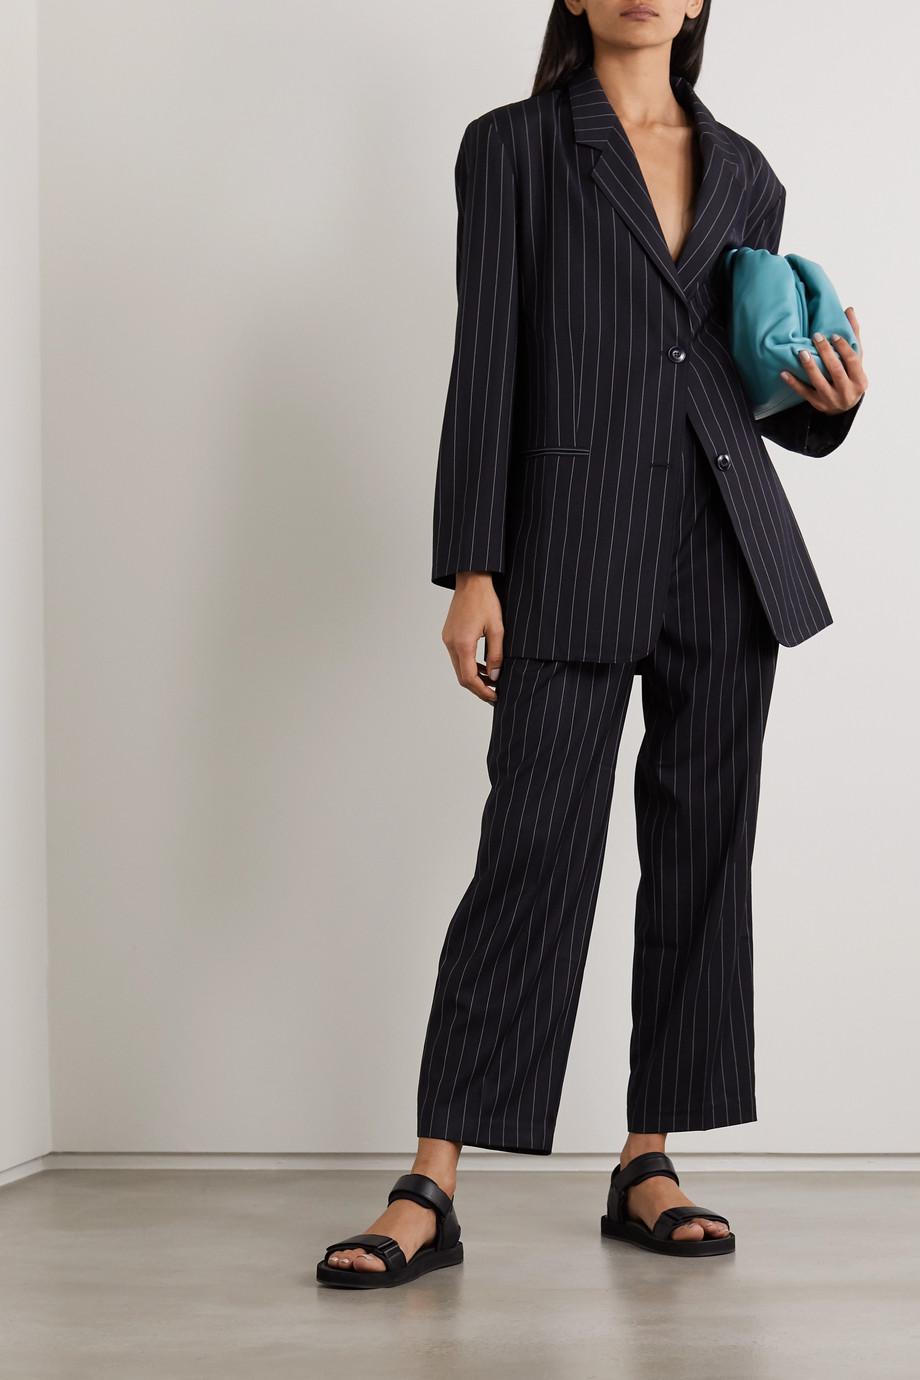 Frankie Shop Pernille oversized striped woven blazer